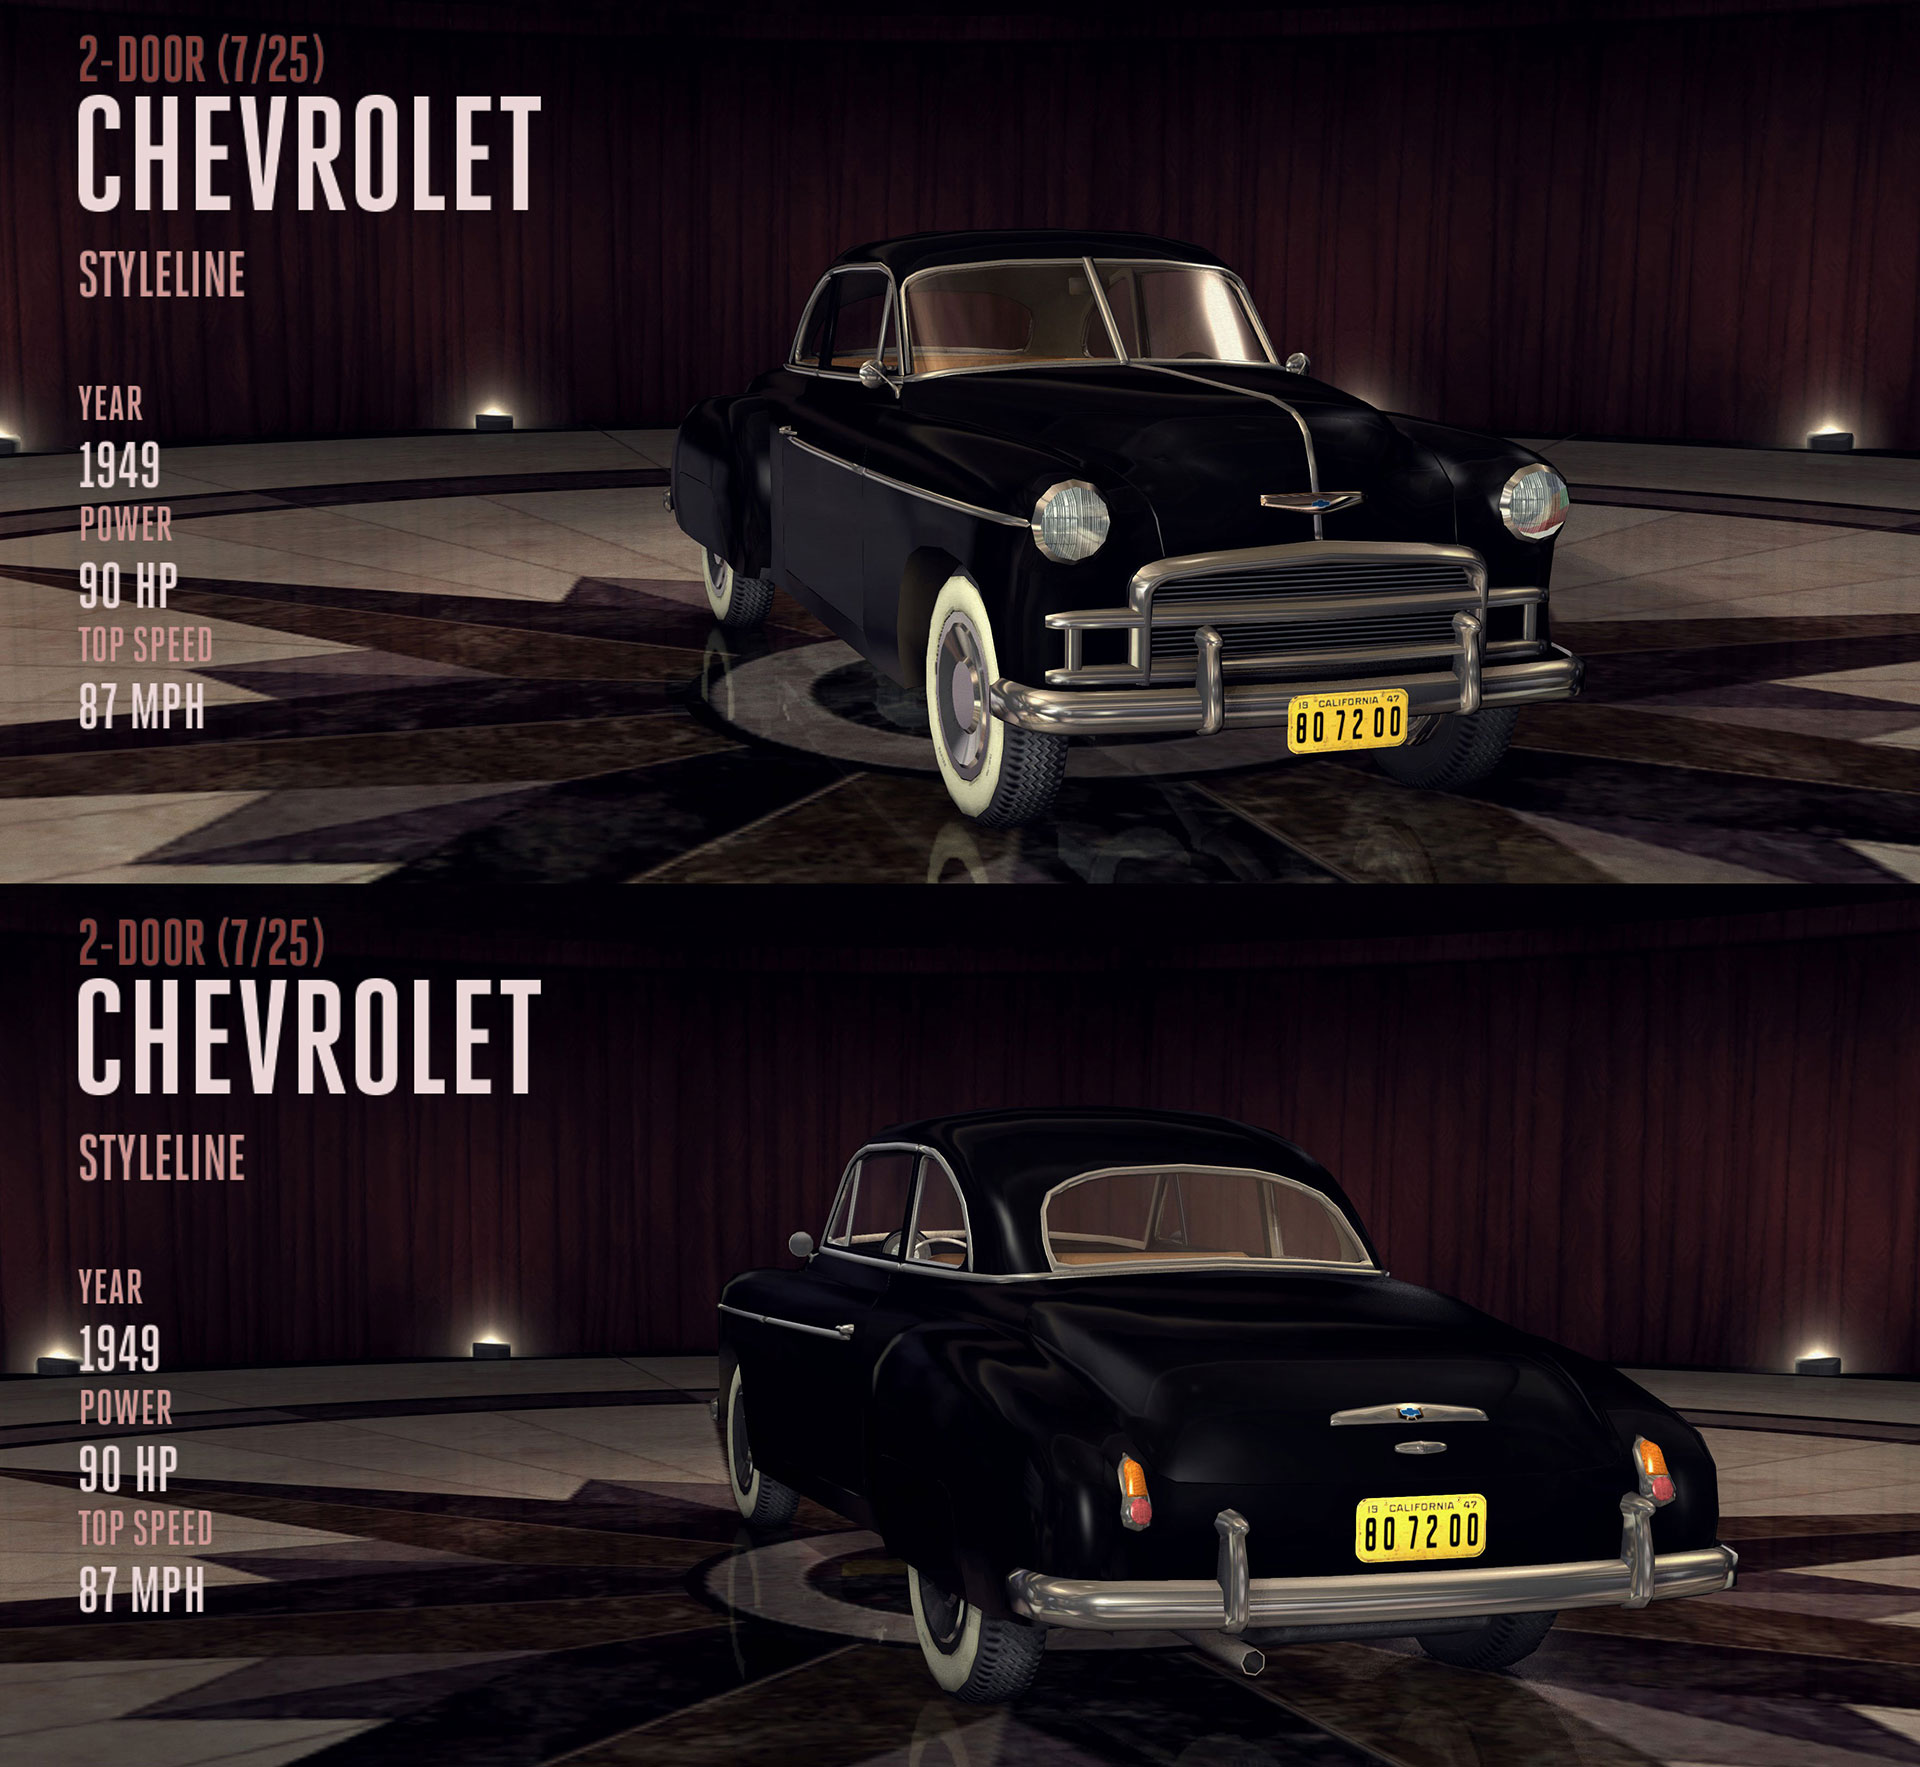 Archivo:1949-chevrolet-styleline.jpg